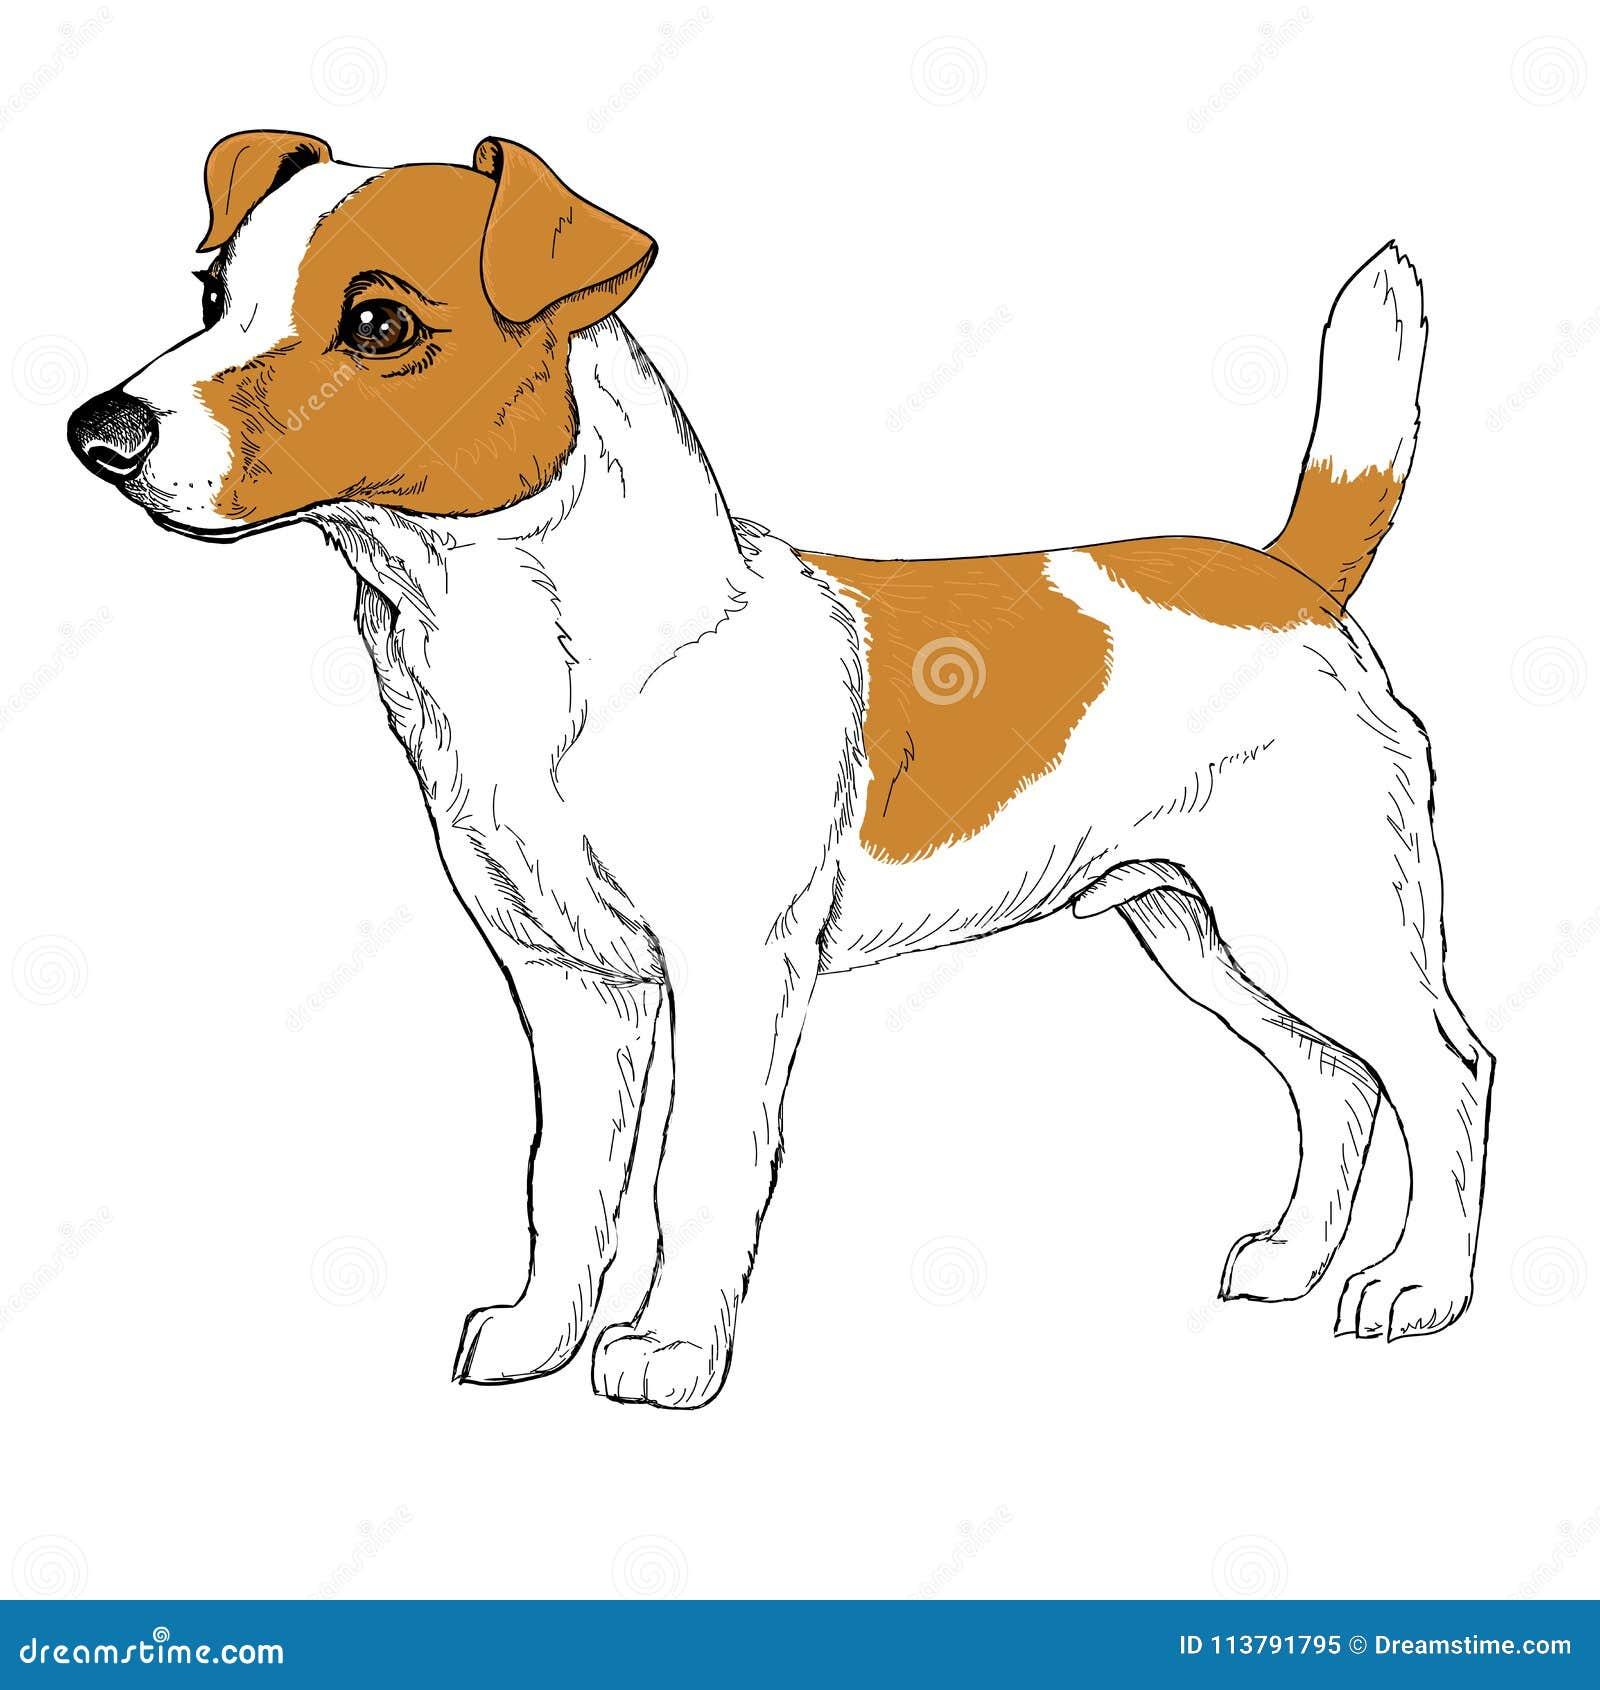 Croquis de chien jaune